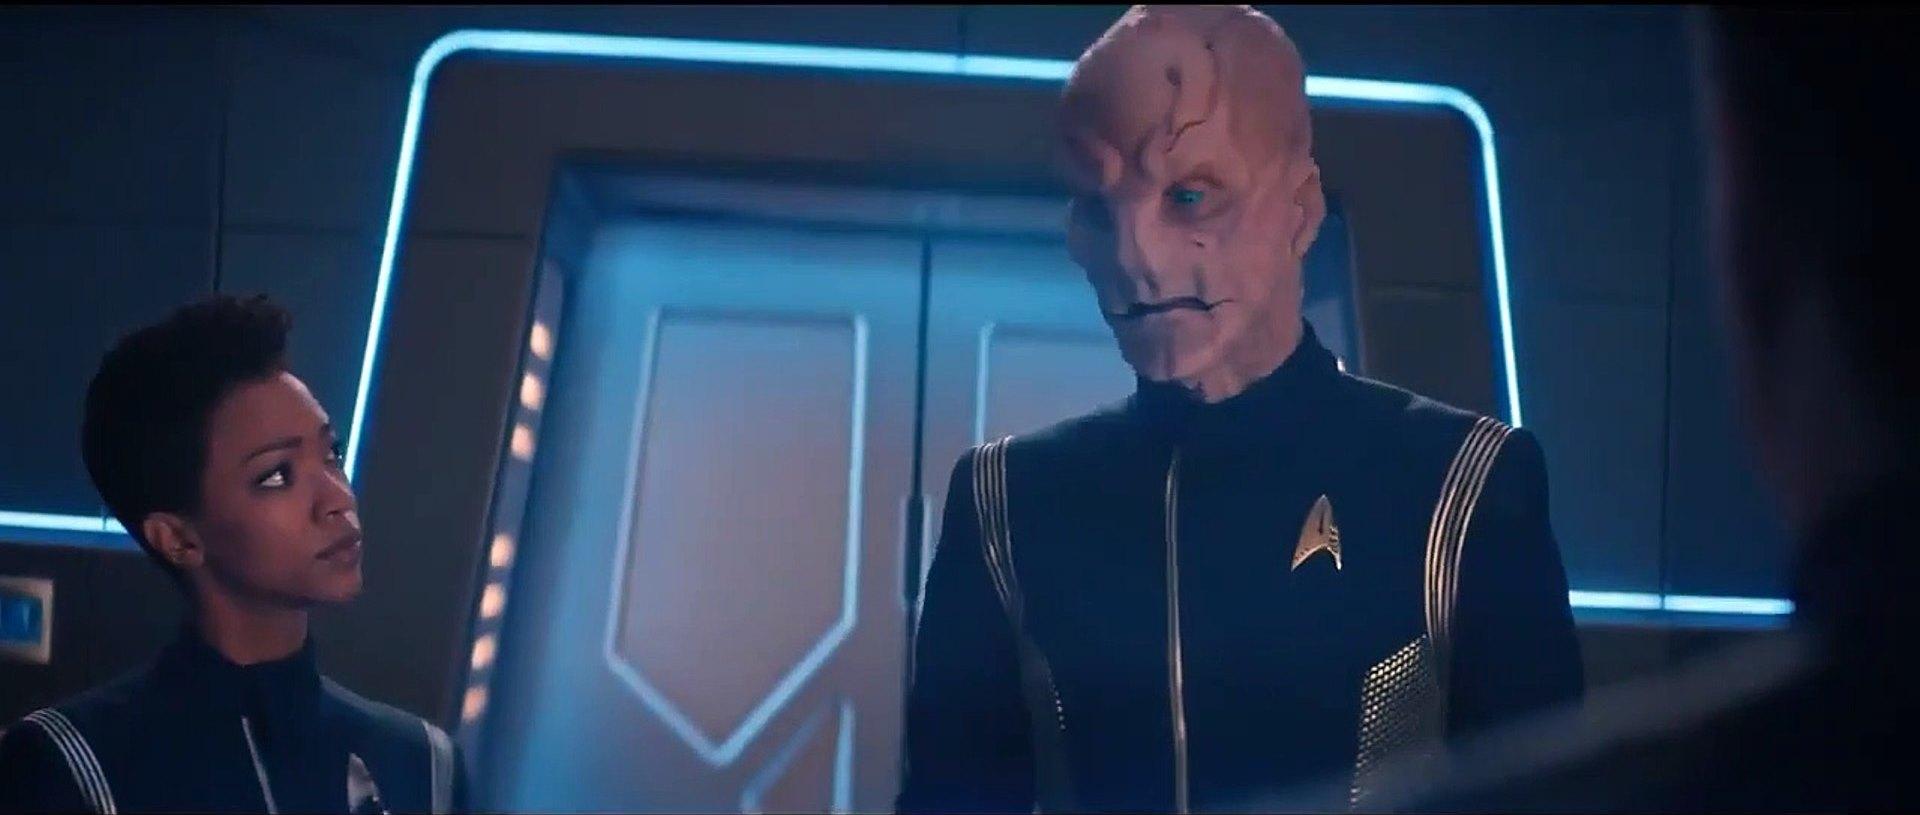 Stark Trek Discovery: Doug Jones durante una scena nell'episodio The Sounds of Thunder